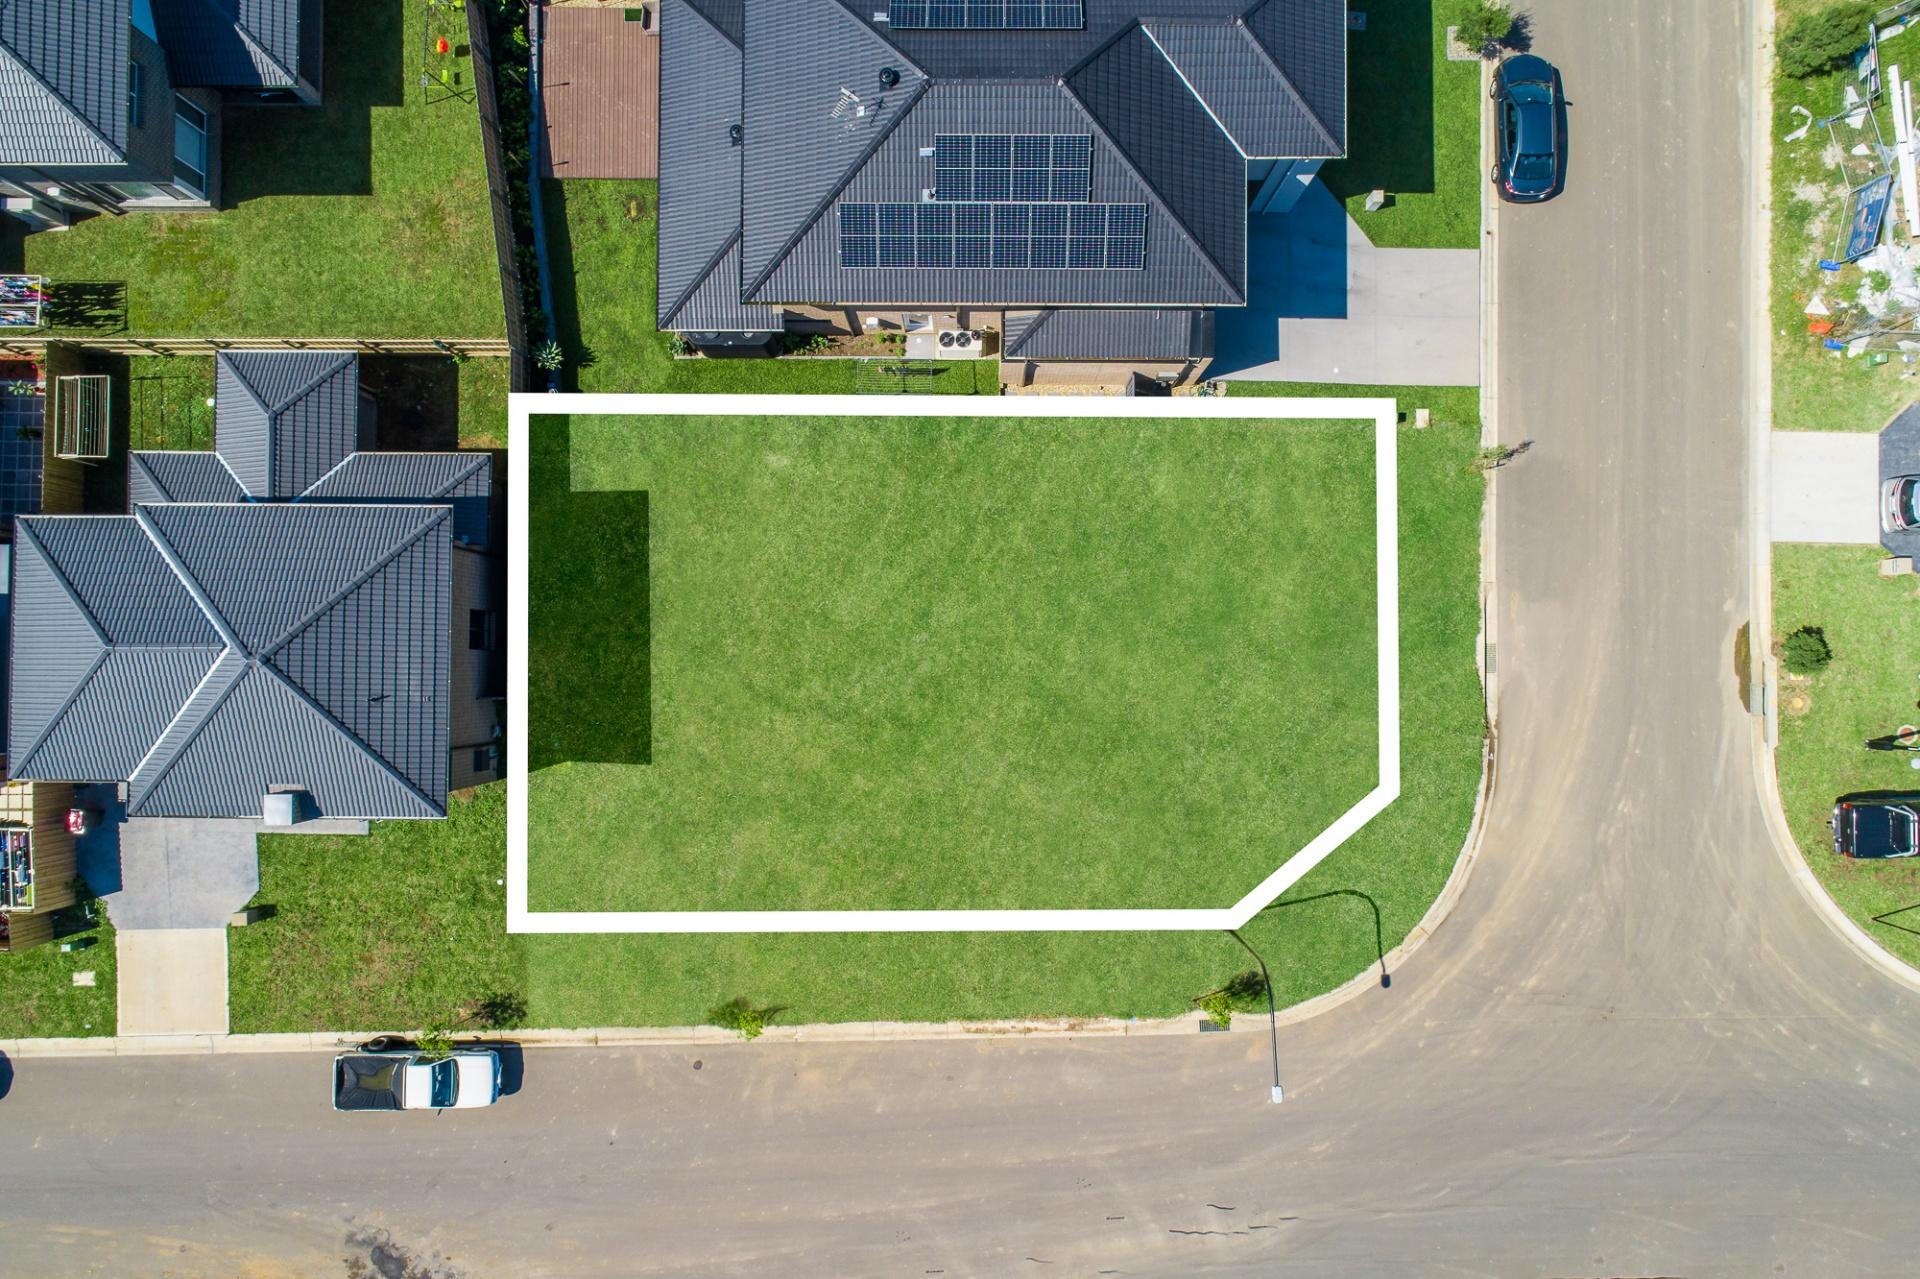 Land, Sold , Avocet Circuit, Listing ID 1368, Marsden Park, NSW, Australia, 2765,